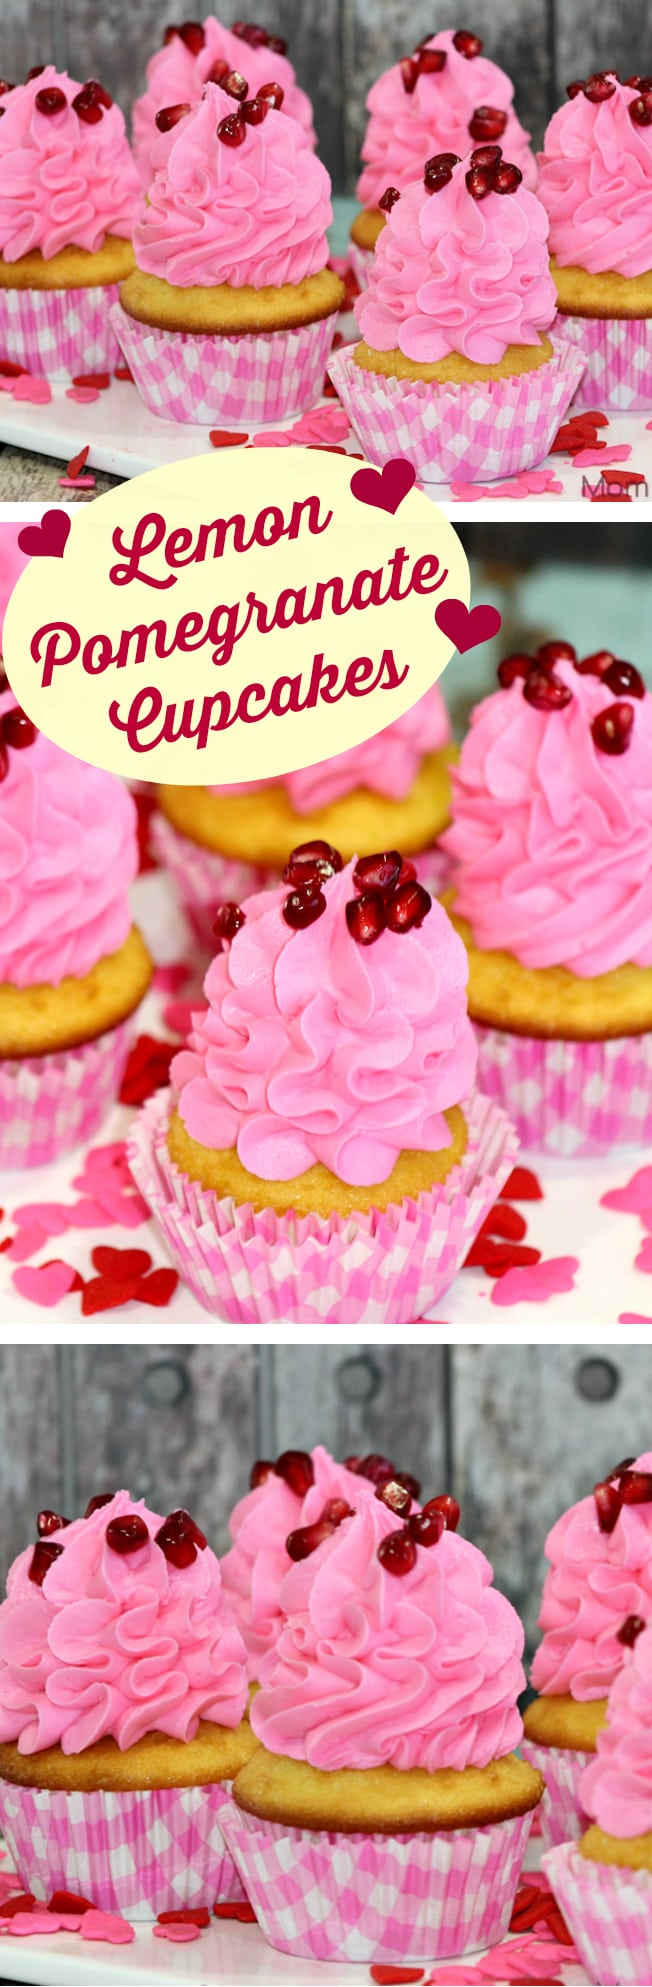 Lemon Pomegrante Cupcakes for Valentines day